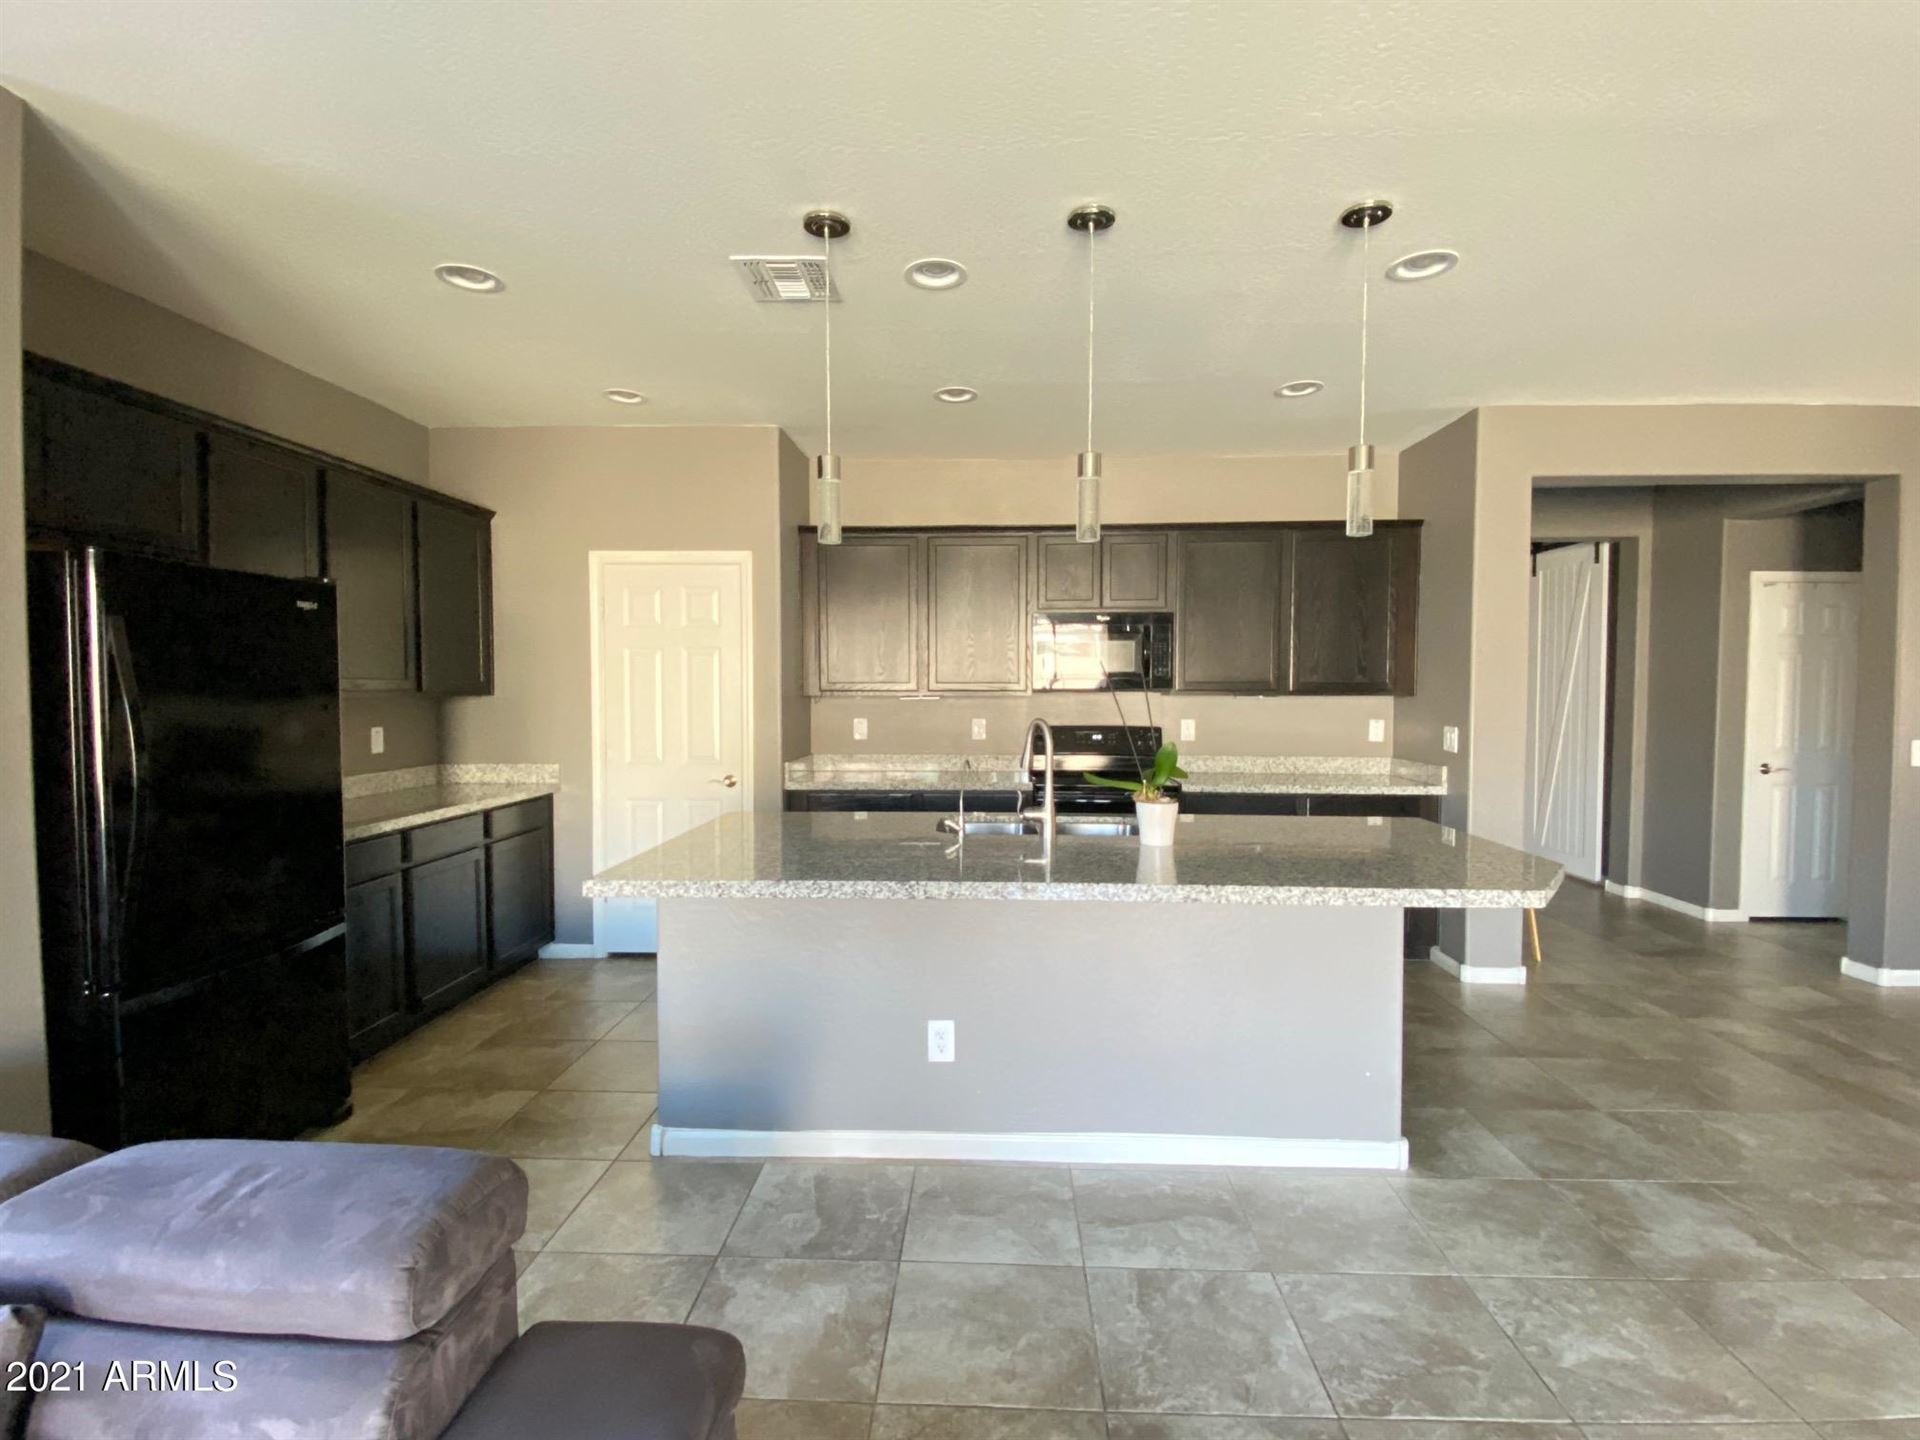 Photo of 20160 W HADLEY Street, Buckeye, AZ 85326 (MLS # 6202331)